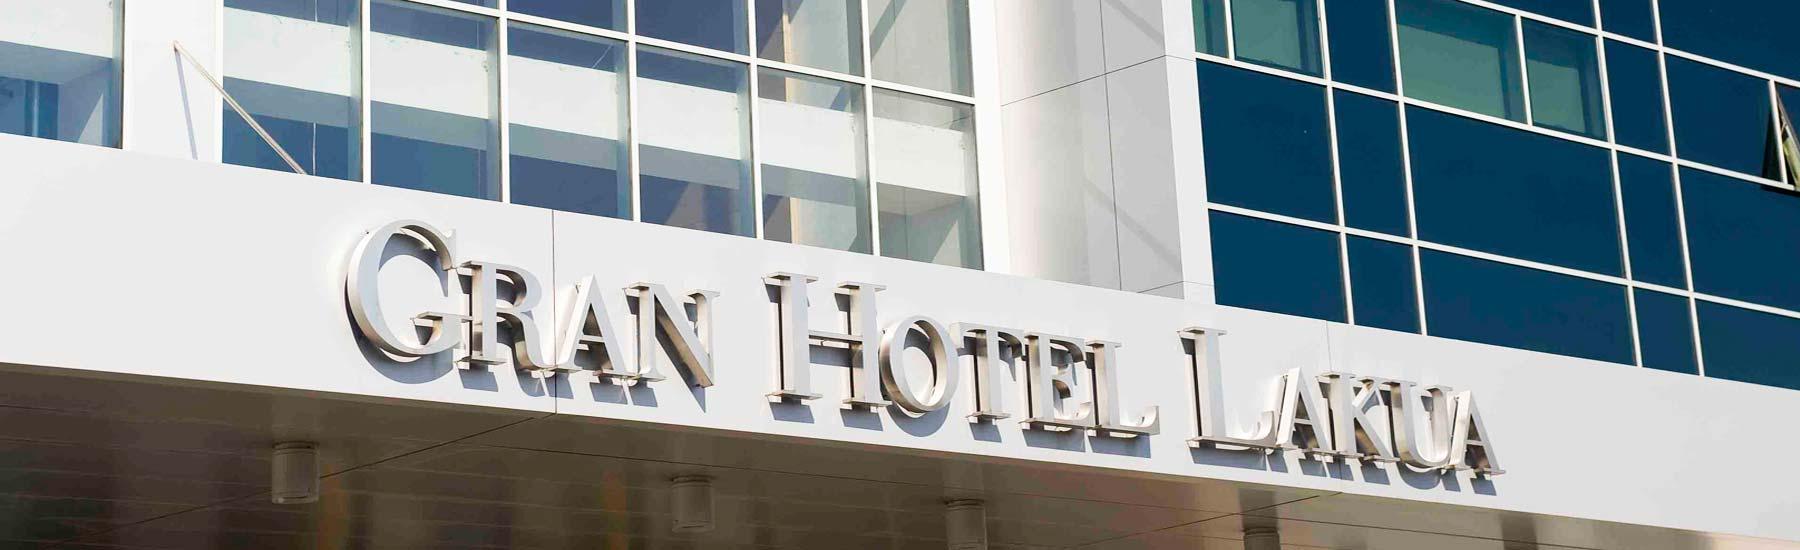 hotel lakua en vitoria: